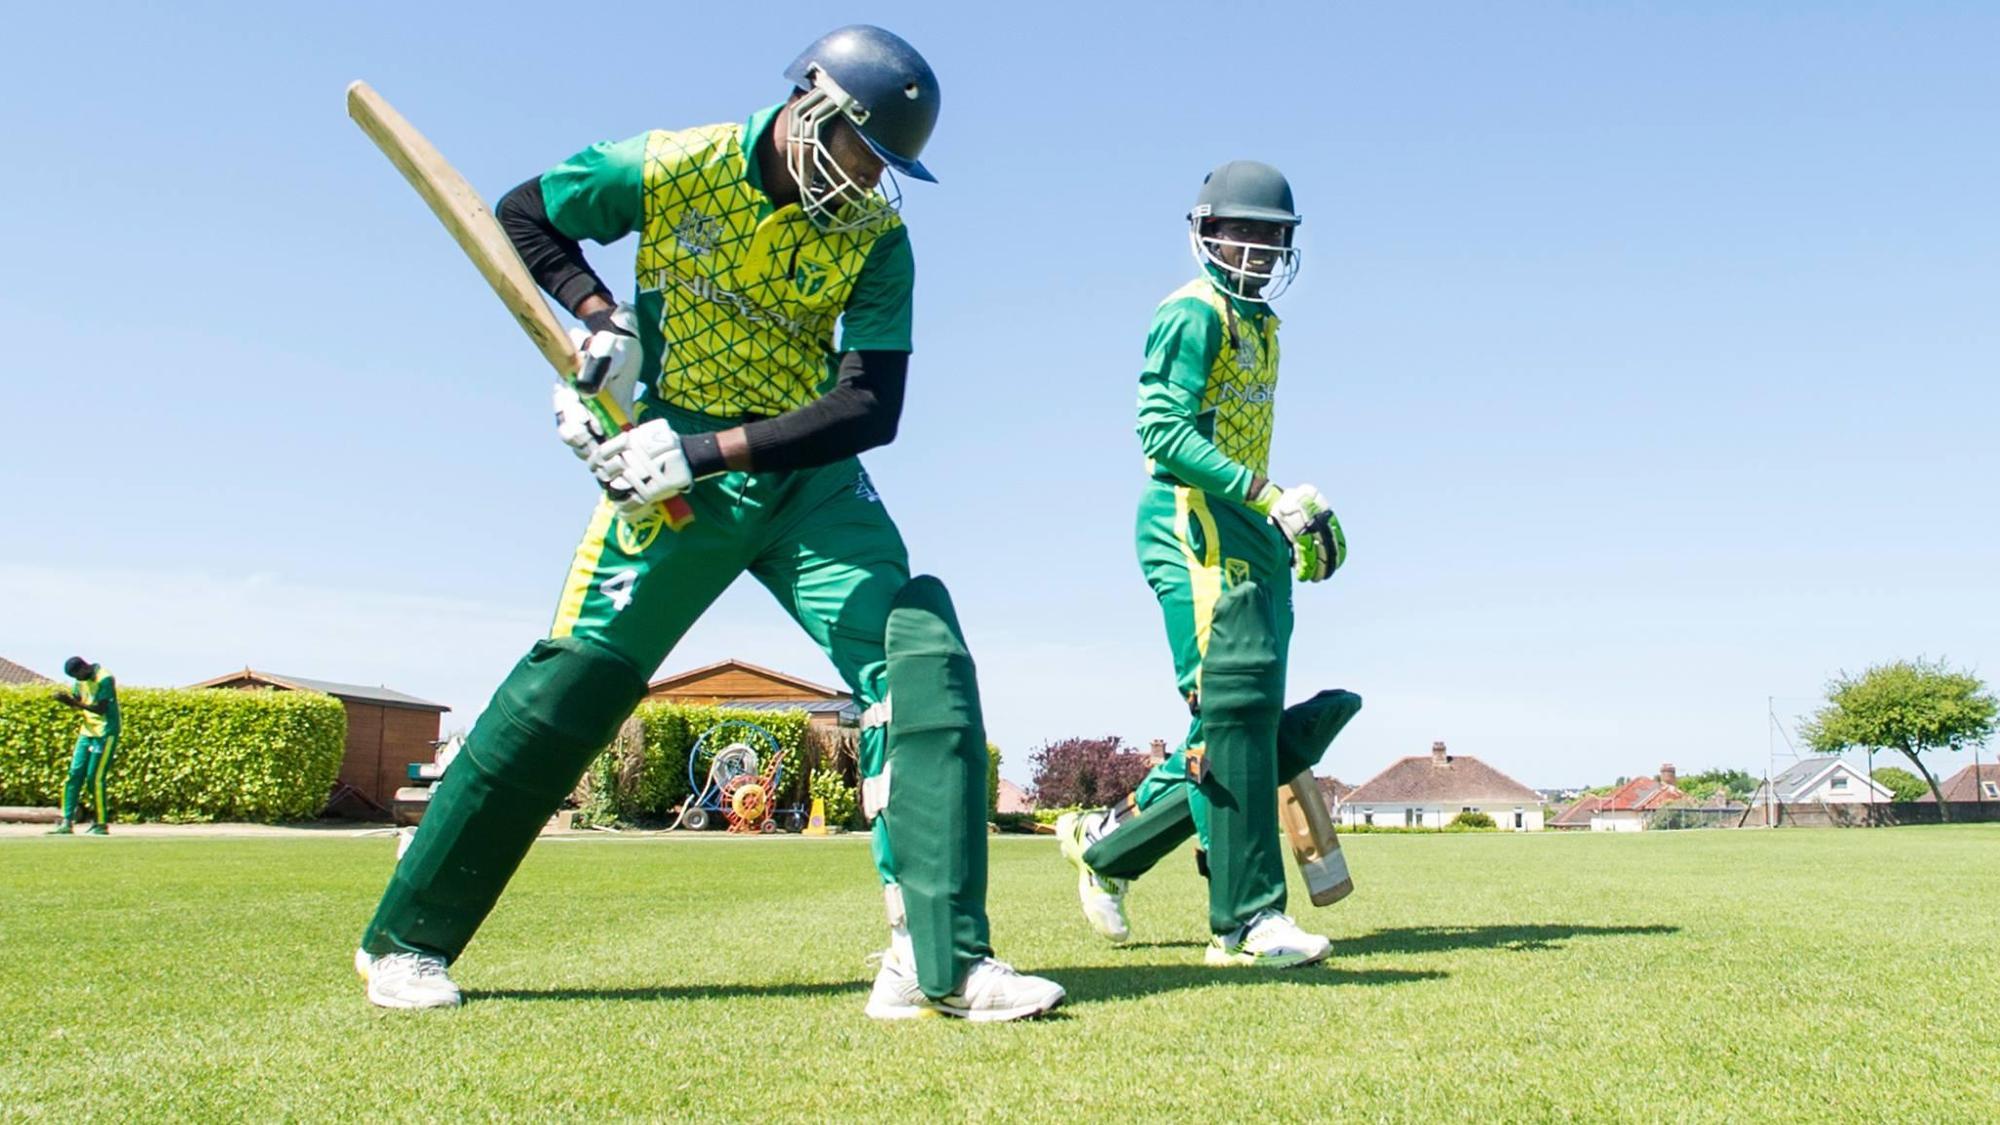 Nigeria hoping to cause surprises in Men's T20 Qualifier - Sports Leo